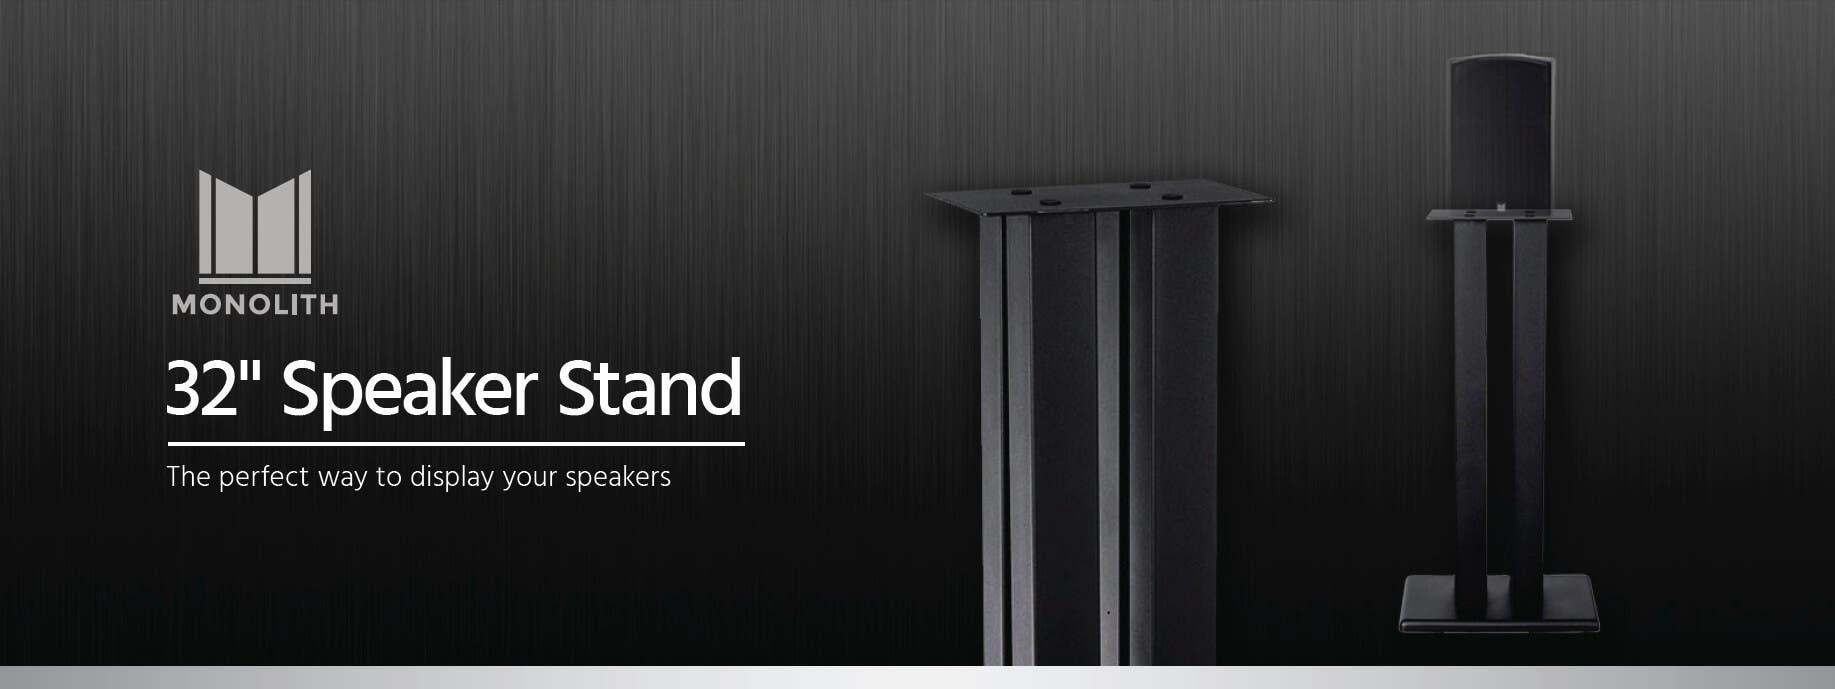 Monolith Speaker Stand